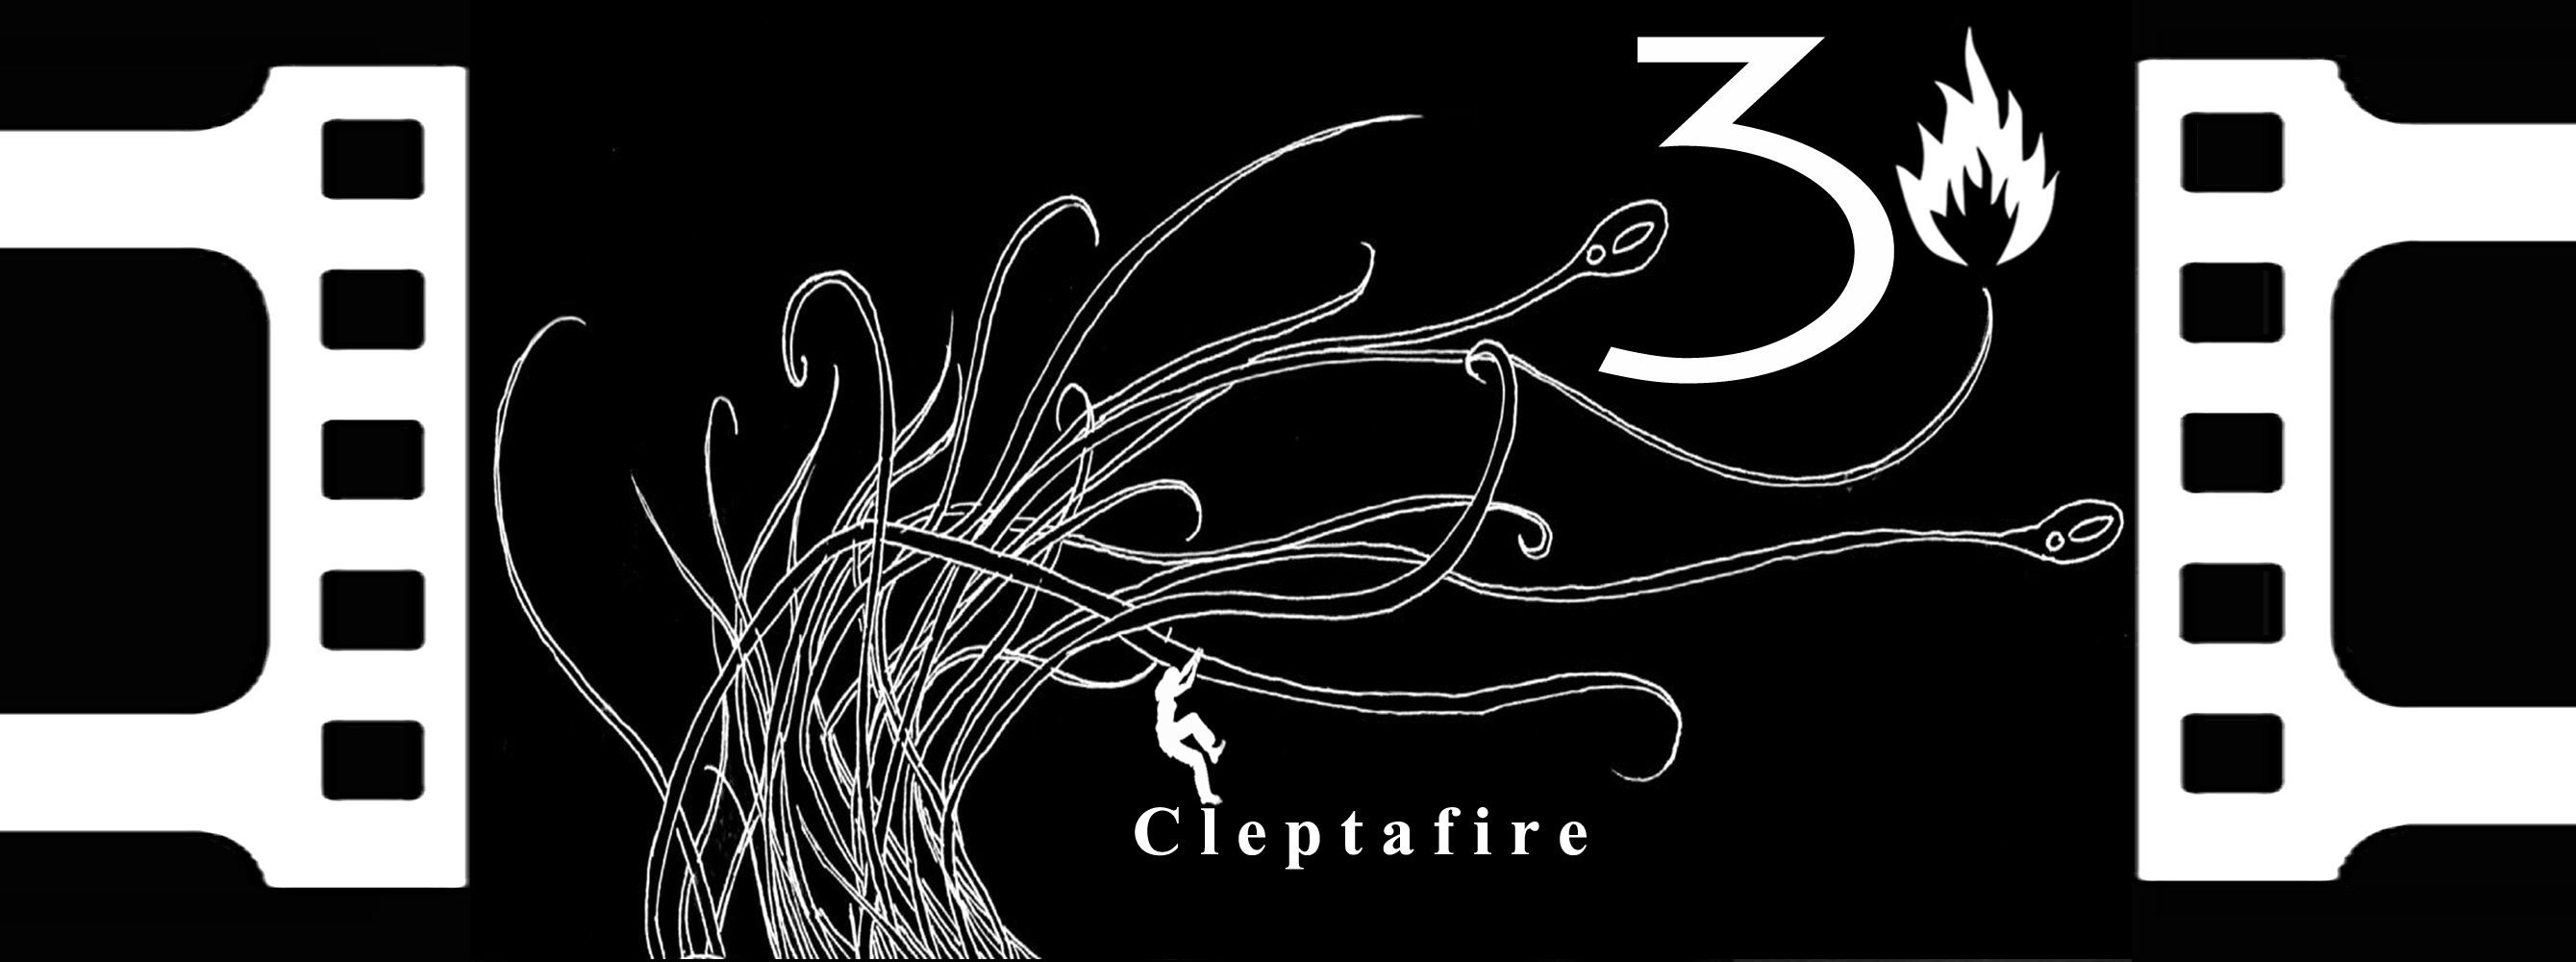 Cleptafire #3